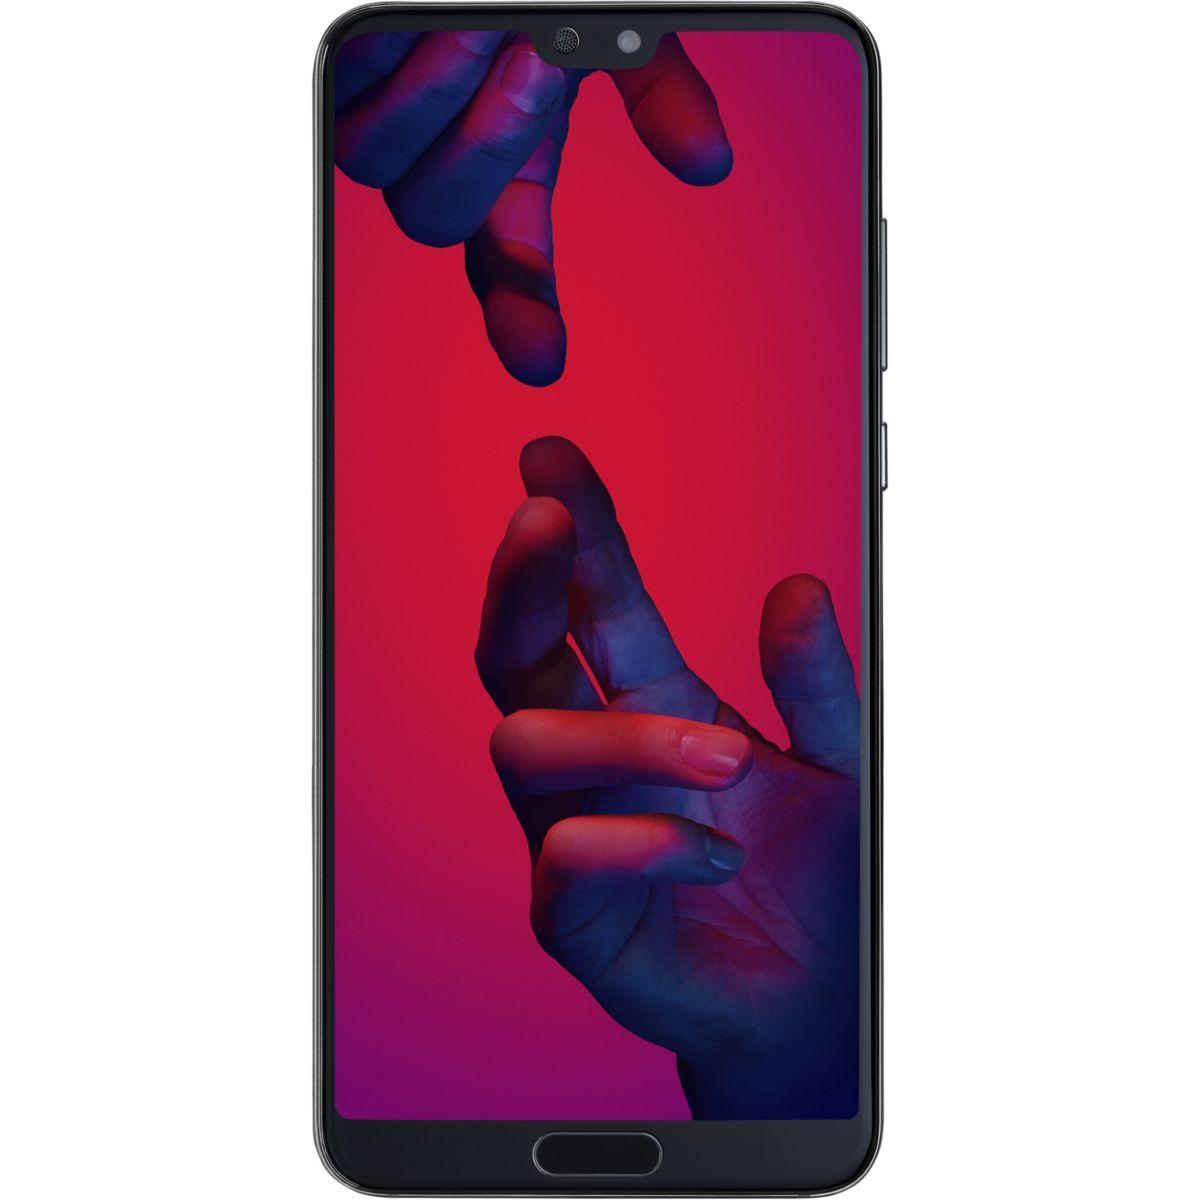 Smartphone huawei p20 pro noir - livraison offerte : code premium